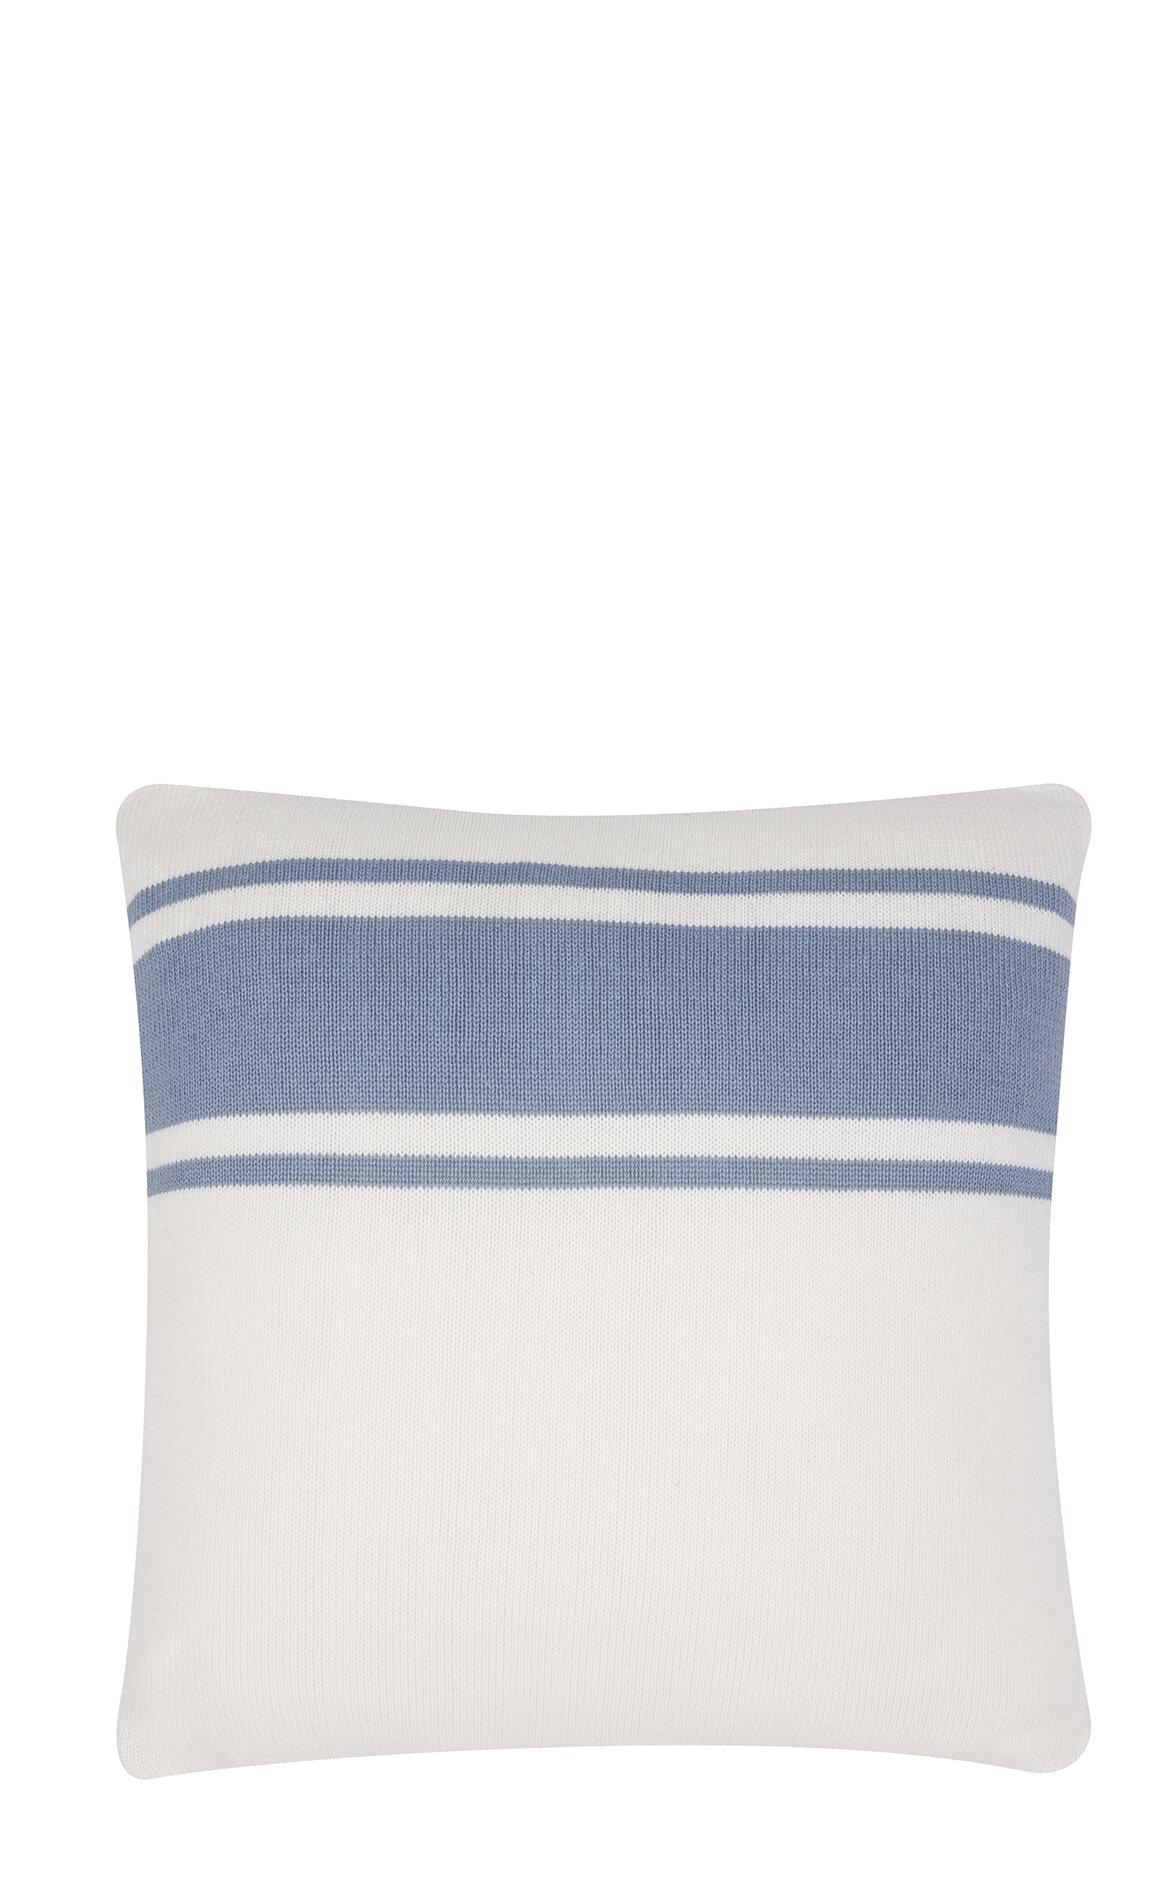 Laura Ashley Ridley Cushion Seaspray Yastık